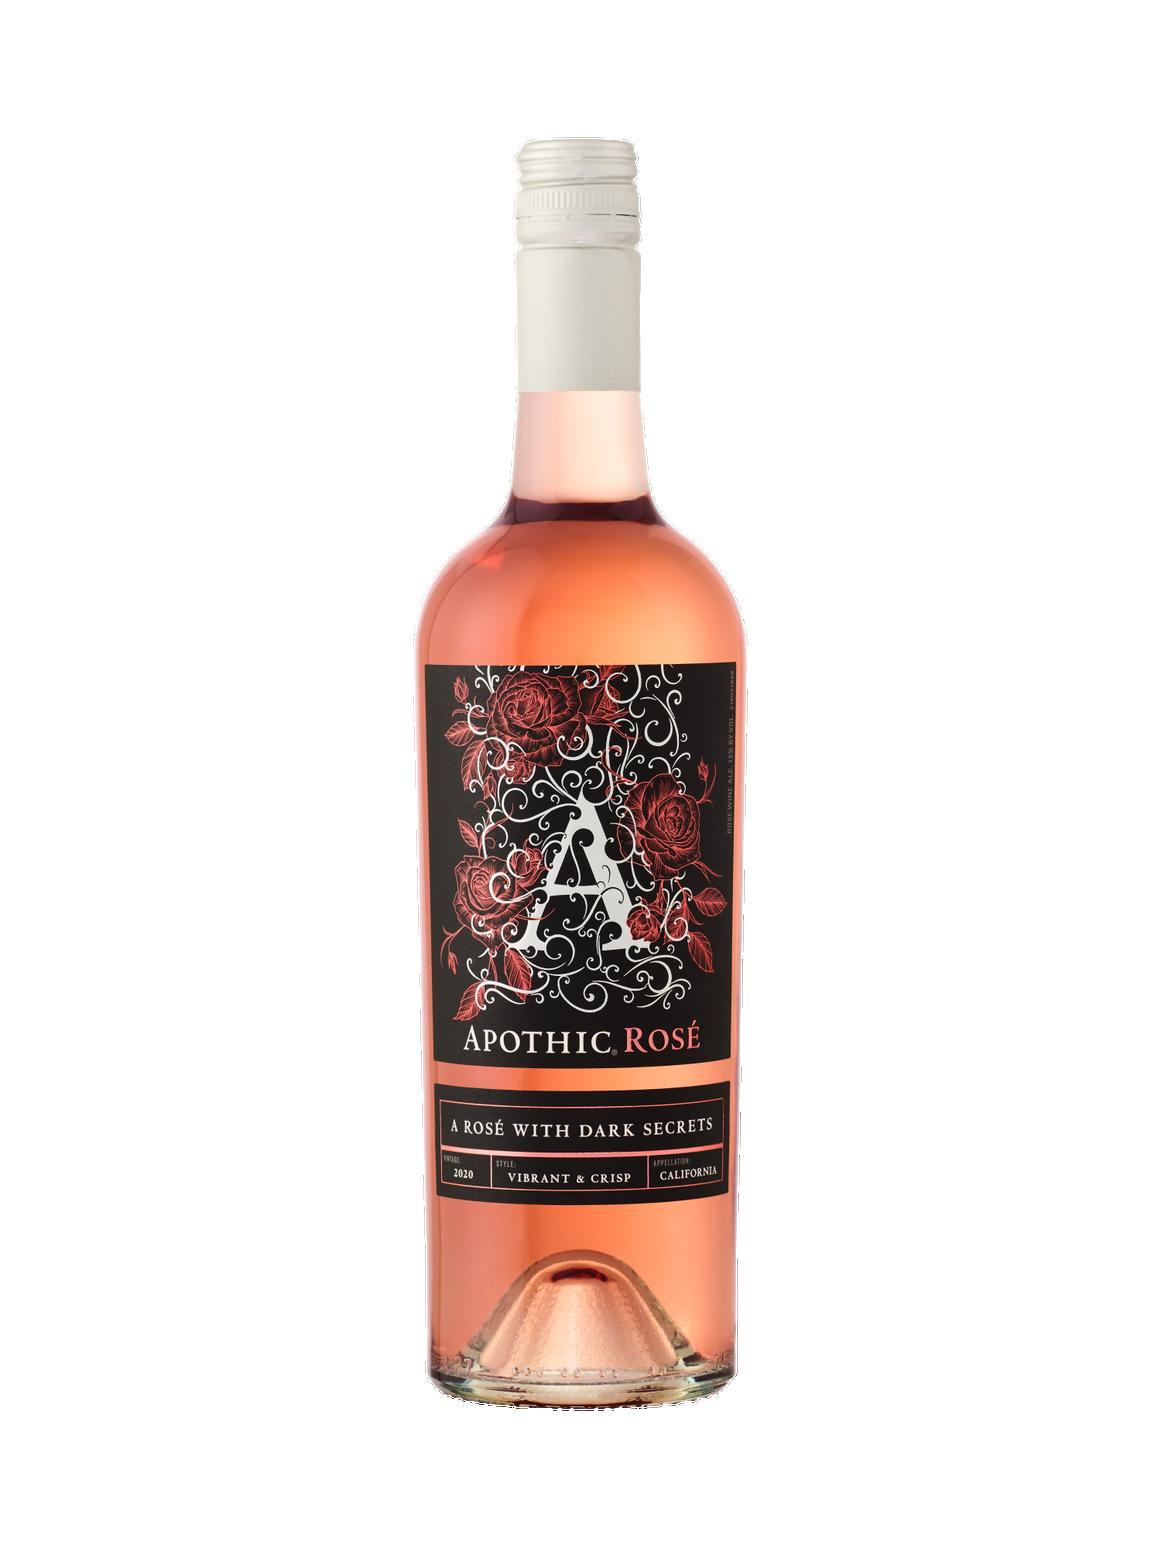 Apothic Rose 750ml NV